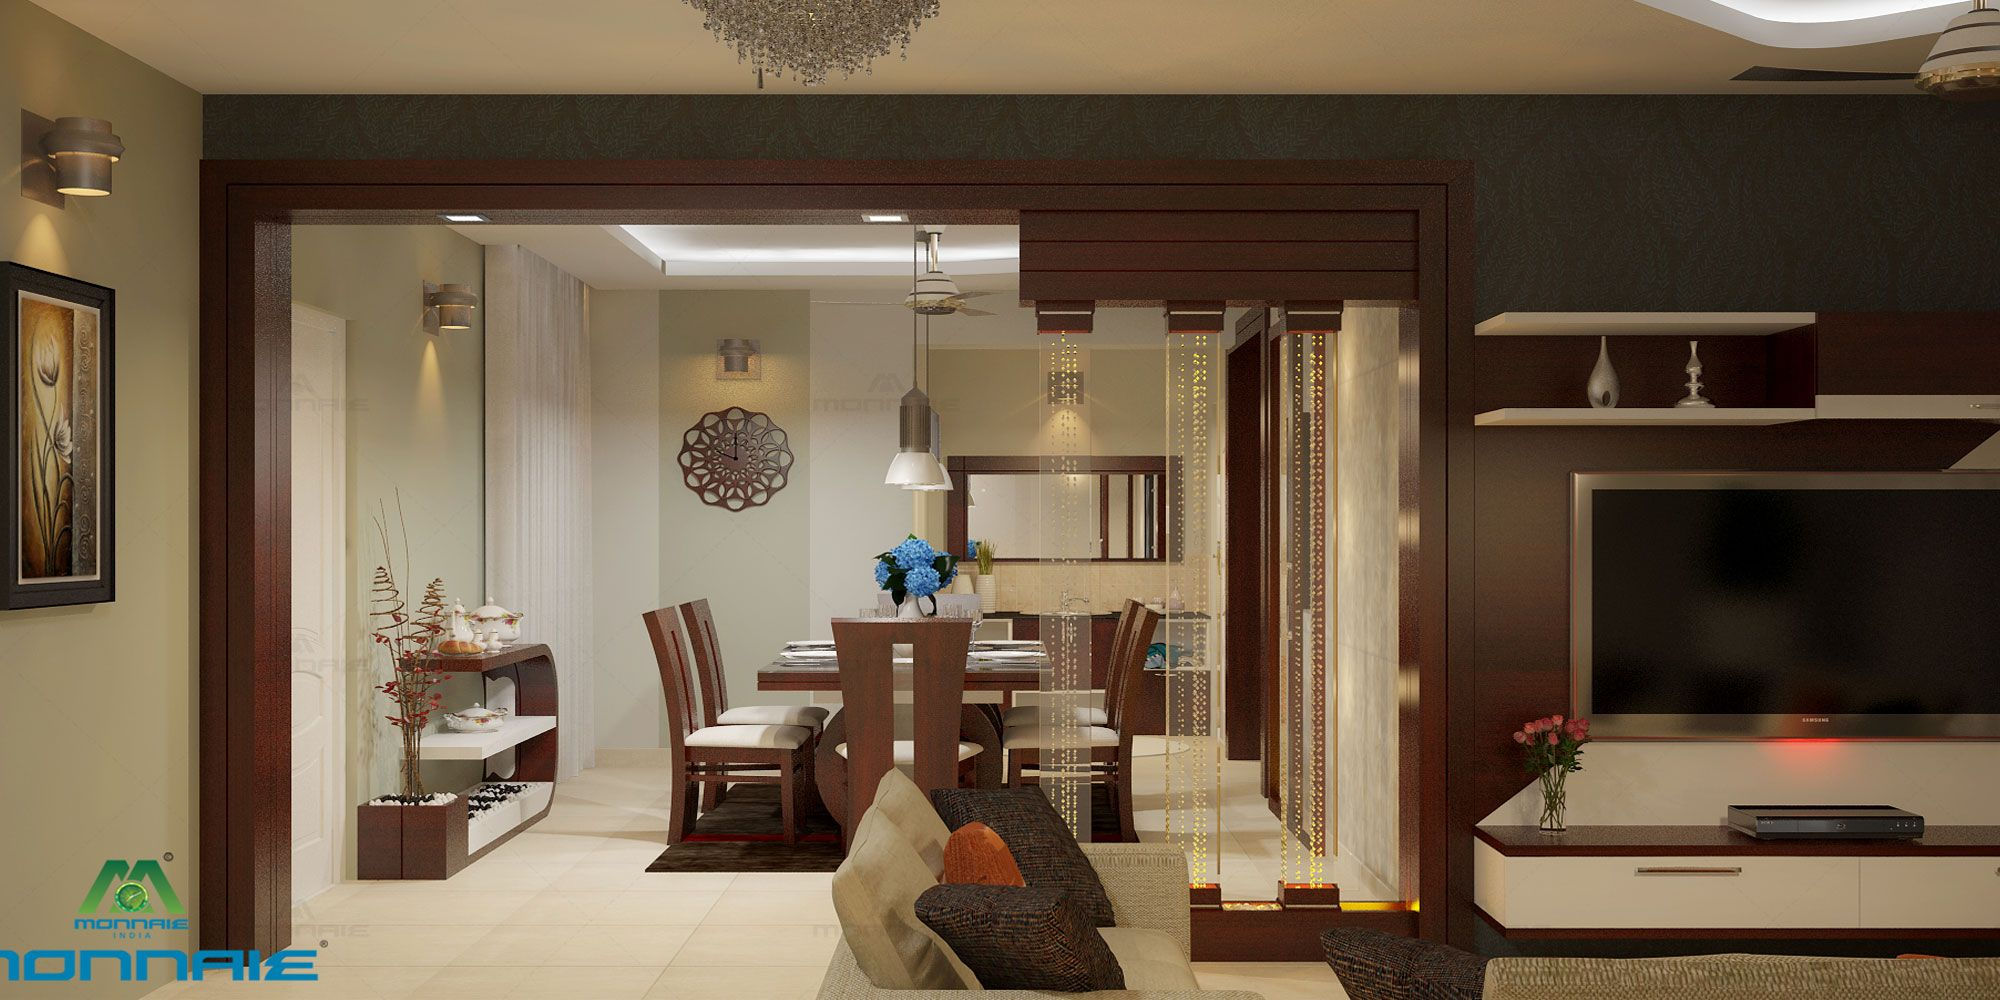 Interiors Designs In Bangalore Monnaie Architects Interiors